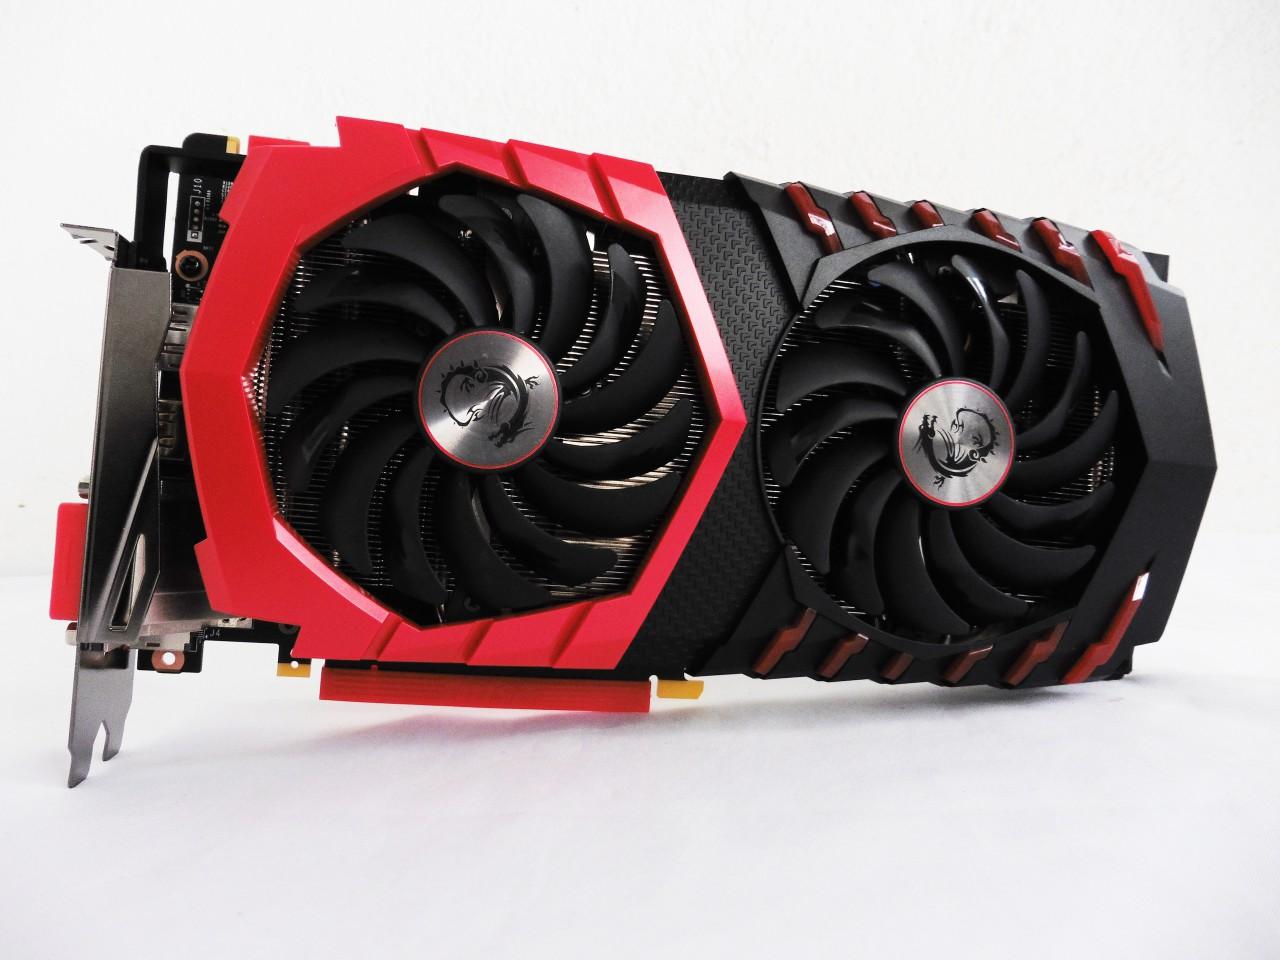 MSI GeForce GTX 1080 Gaming X 8G Review 4